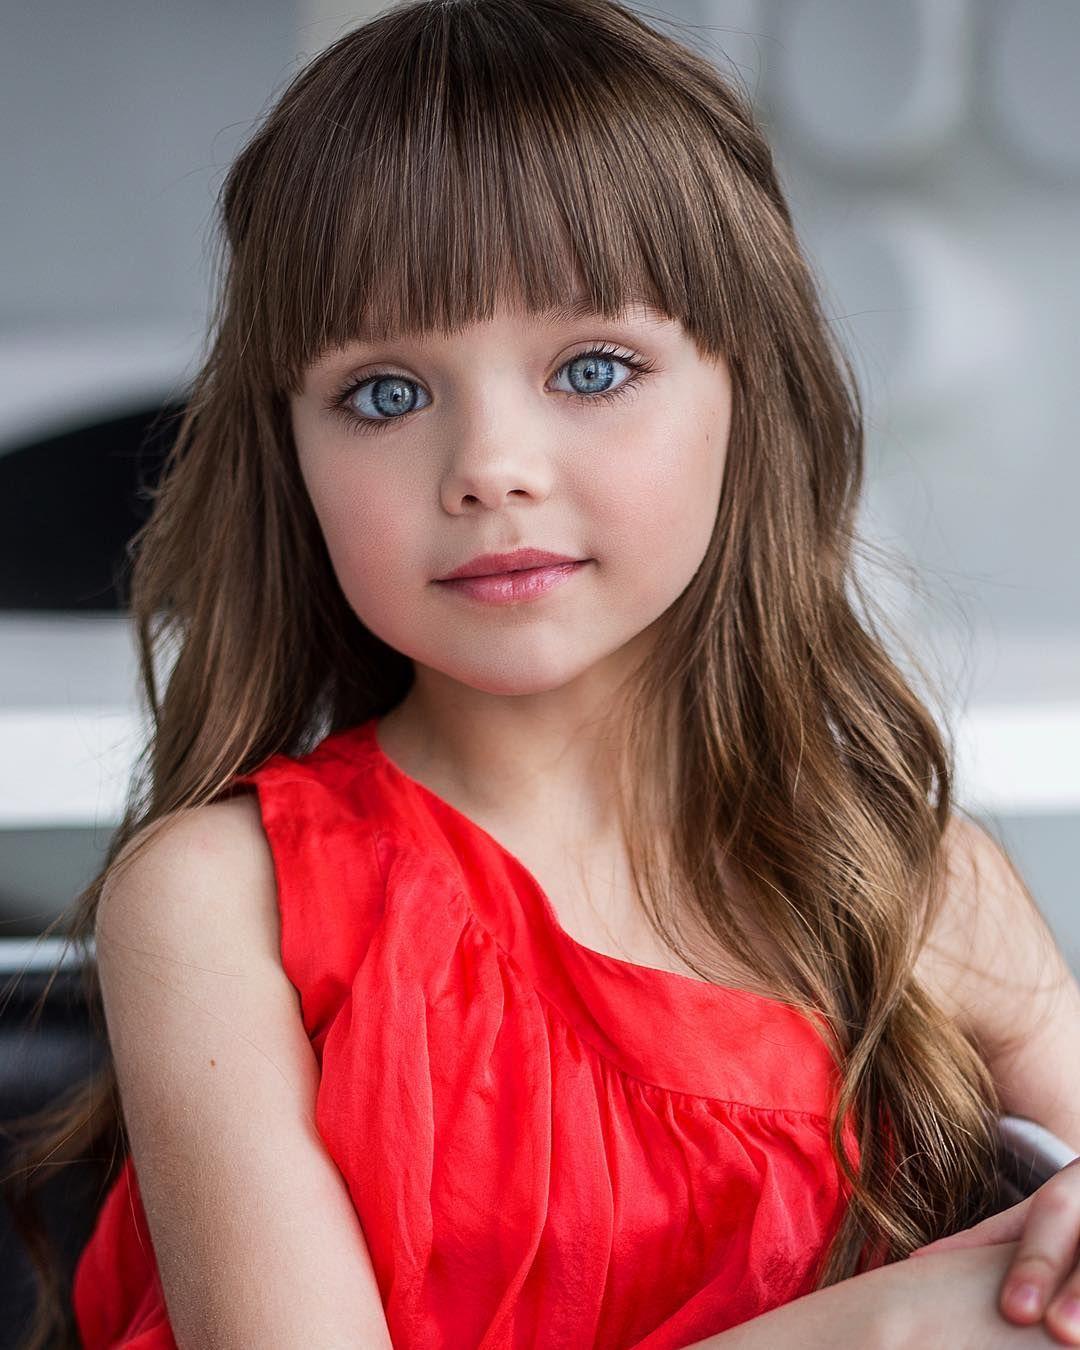 صور اجمل فتاة , اجمل فتيات وبنات بالصور